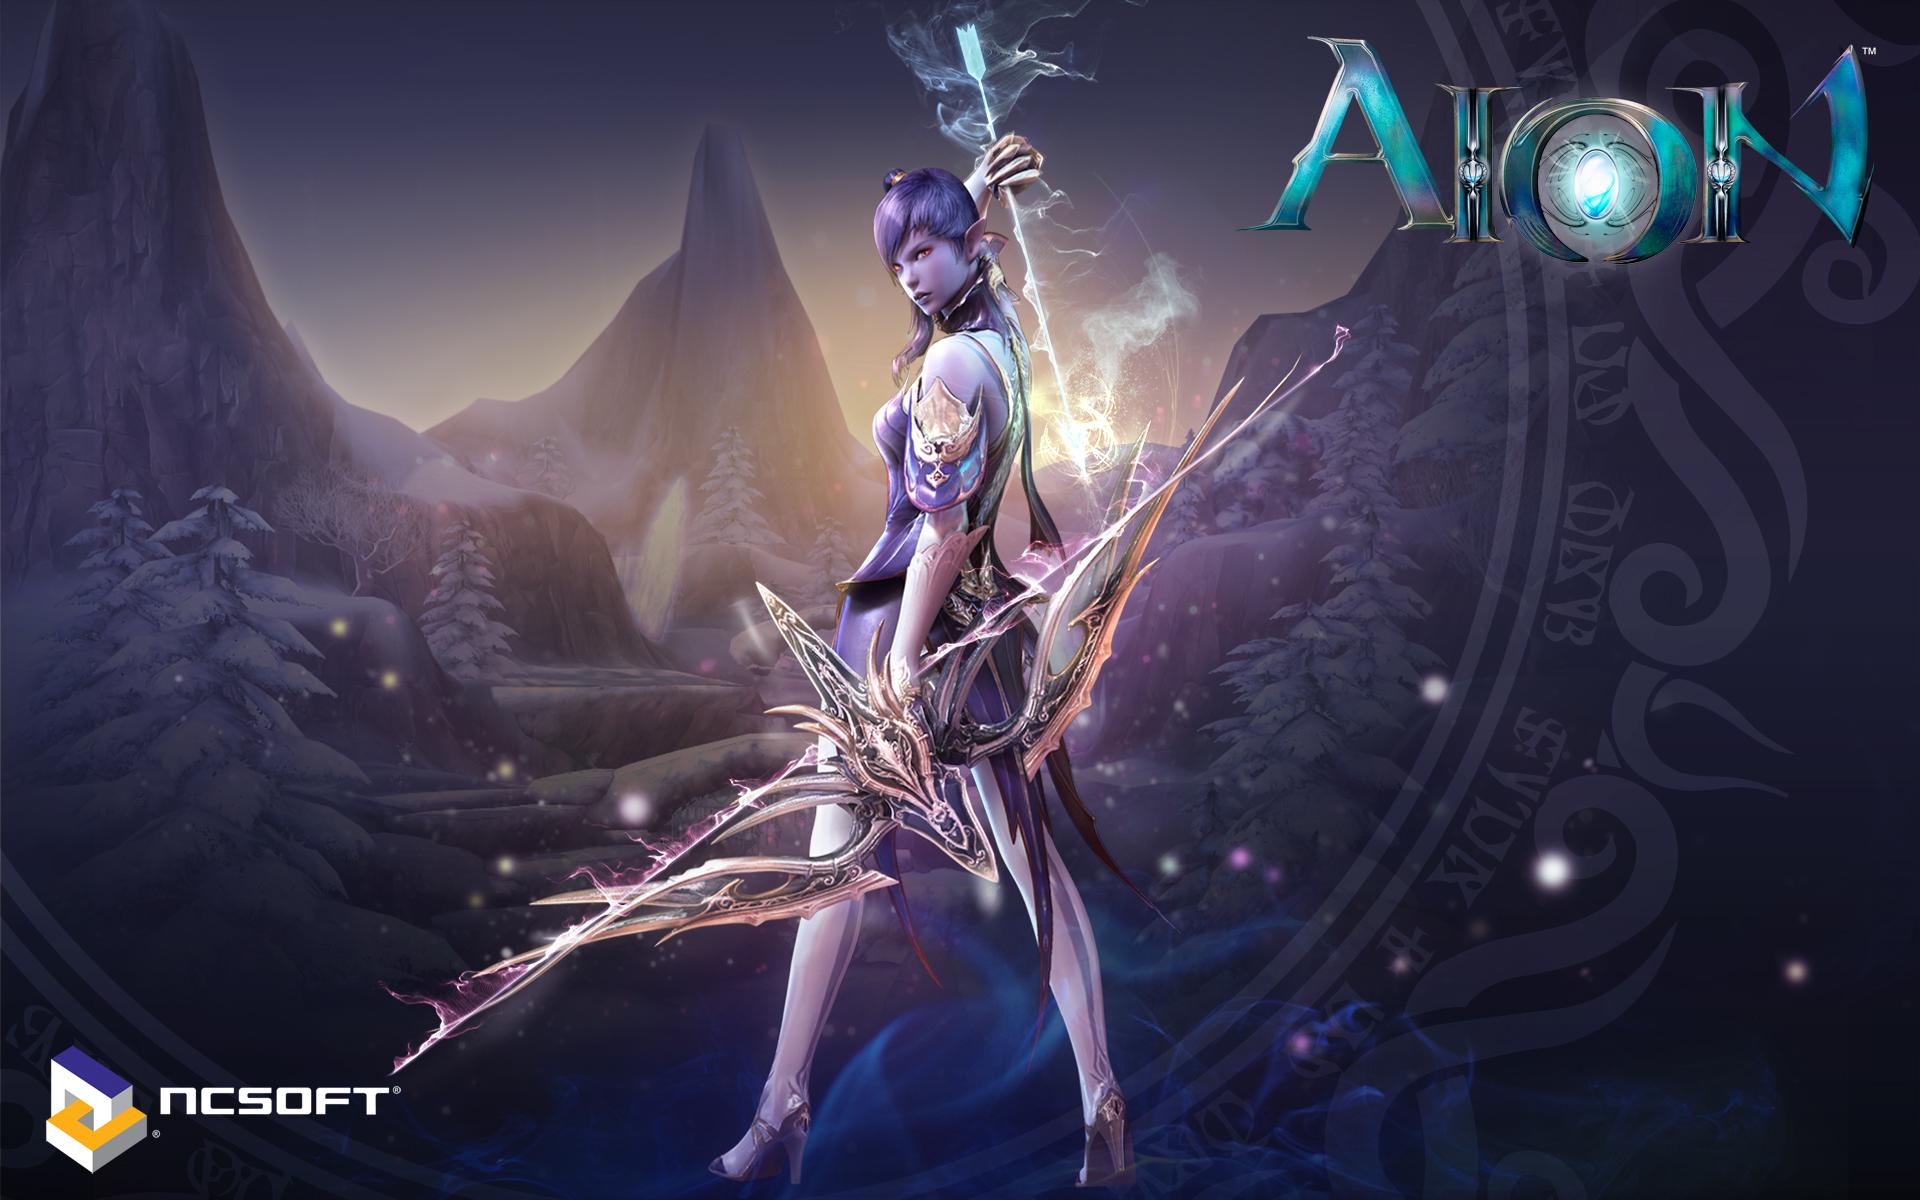 Aion Wallpaper 013 – Asmodian Ranger